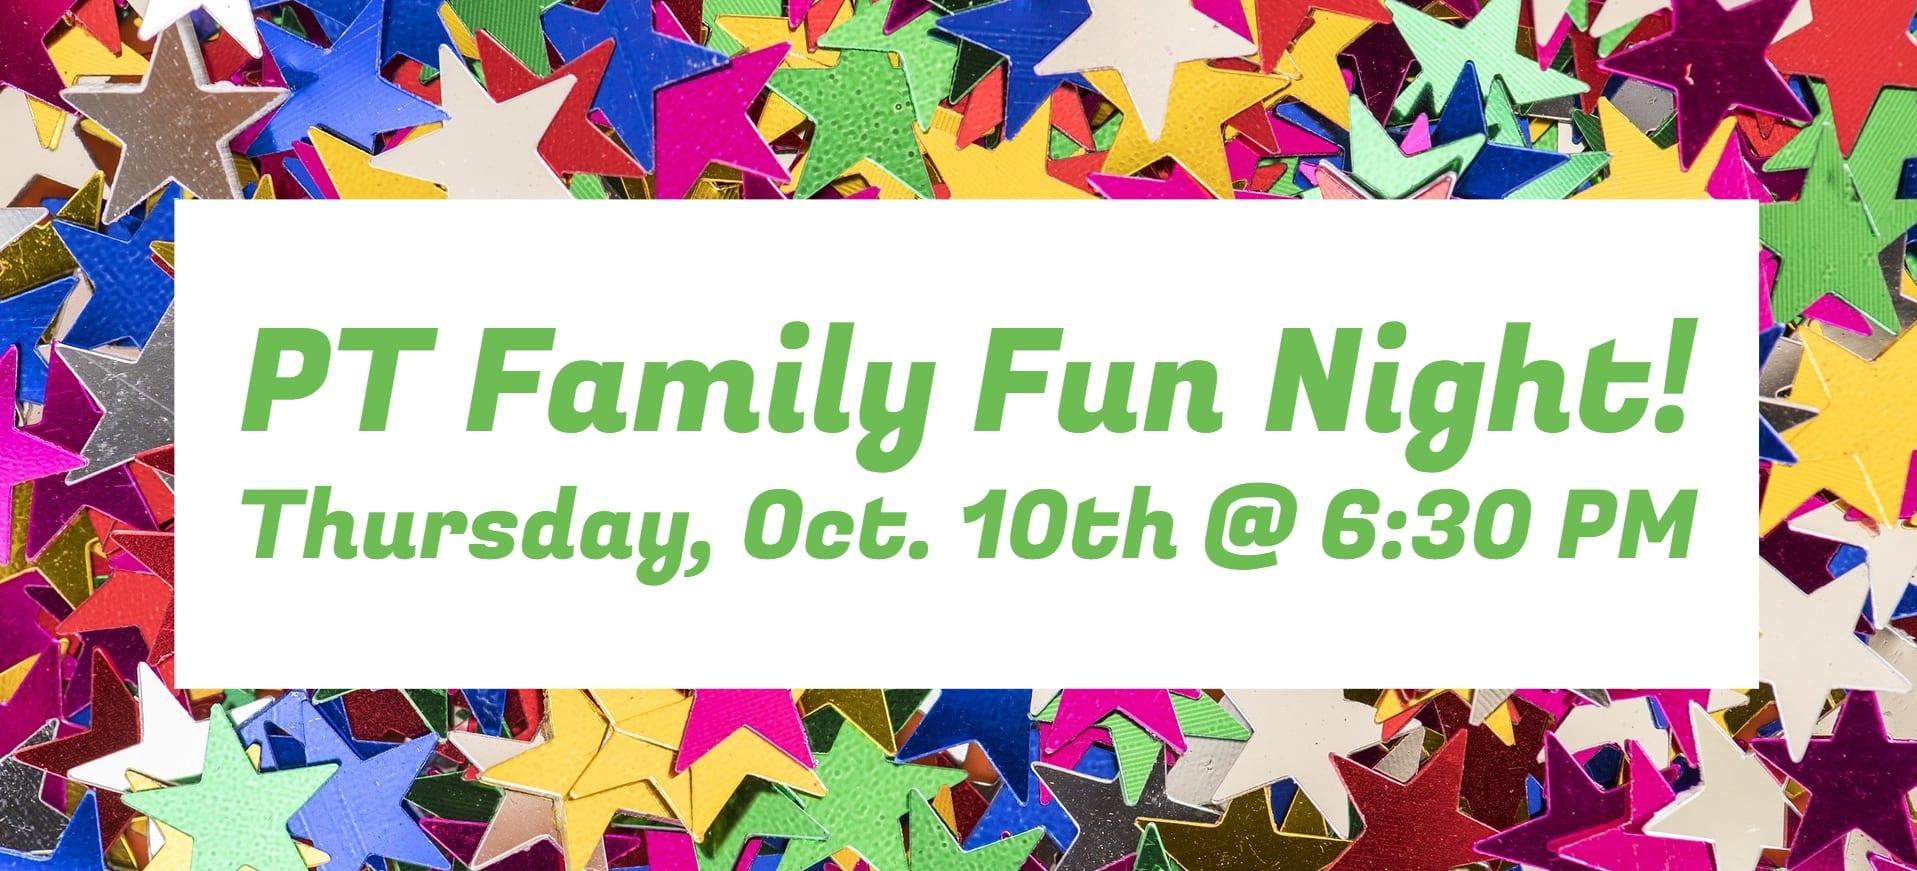 PT Family Fun Night!